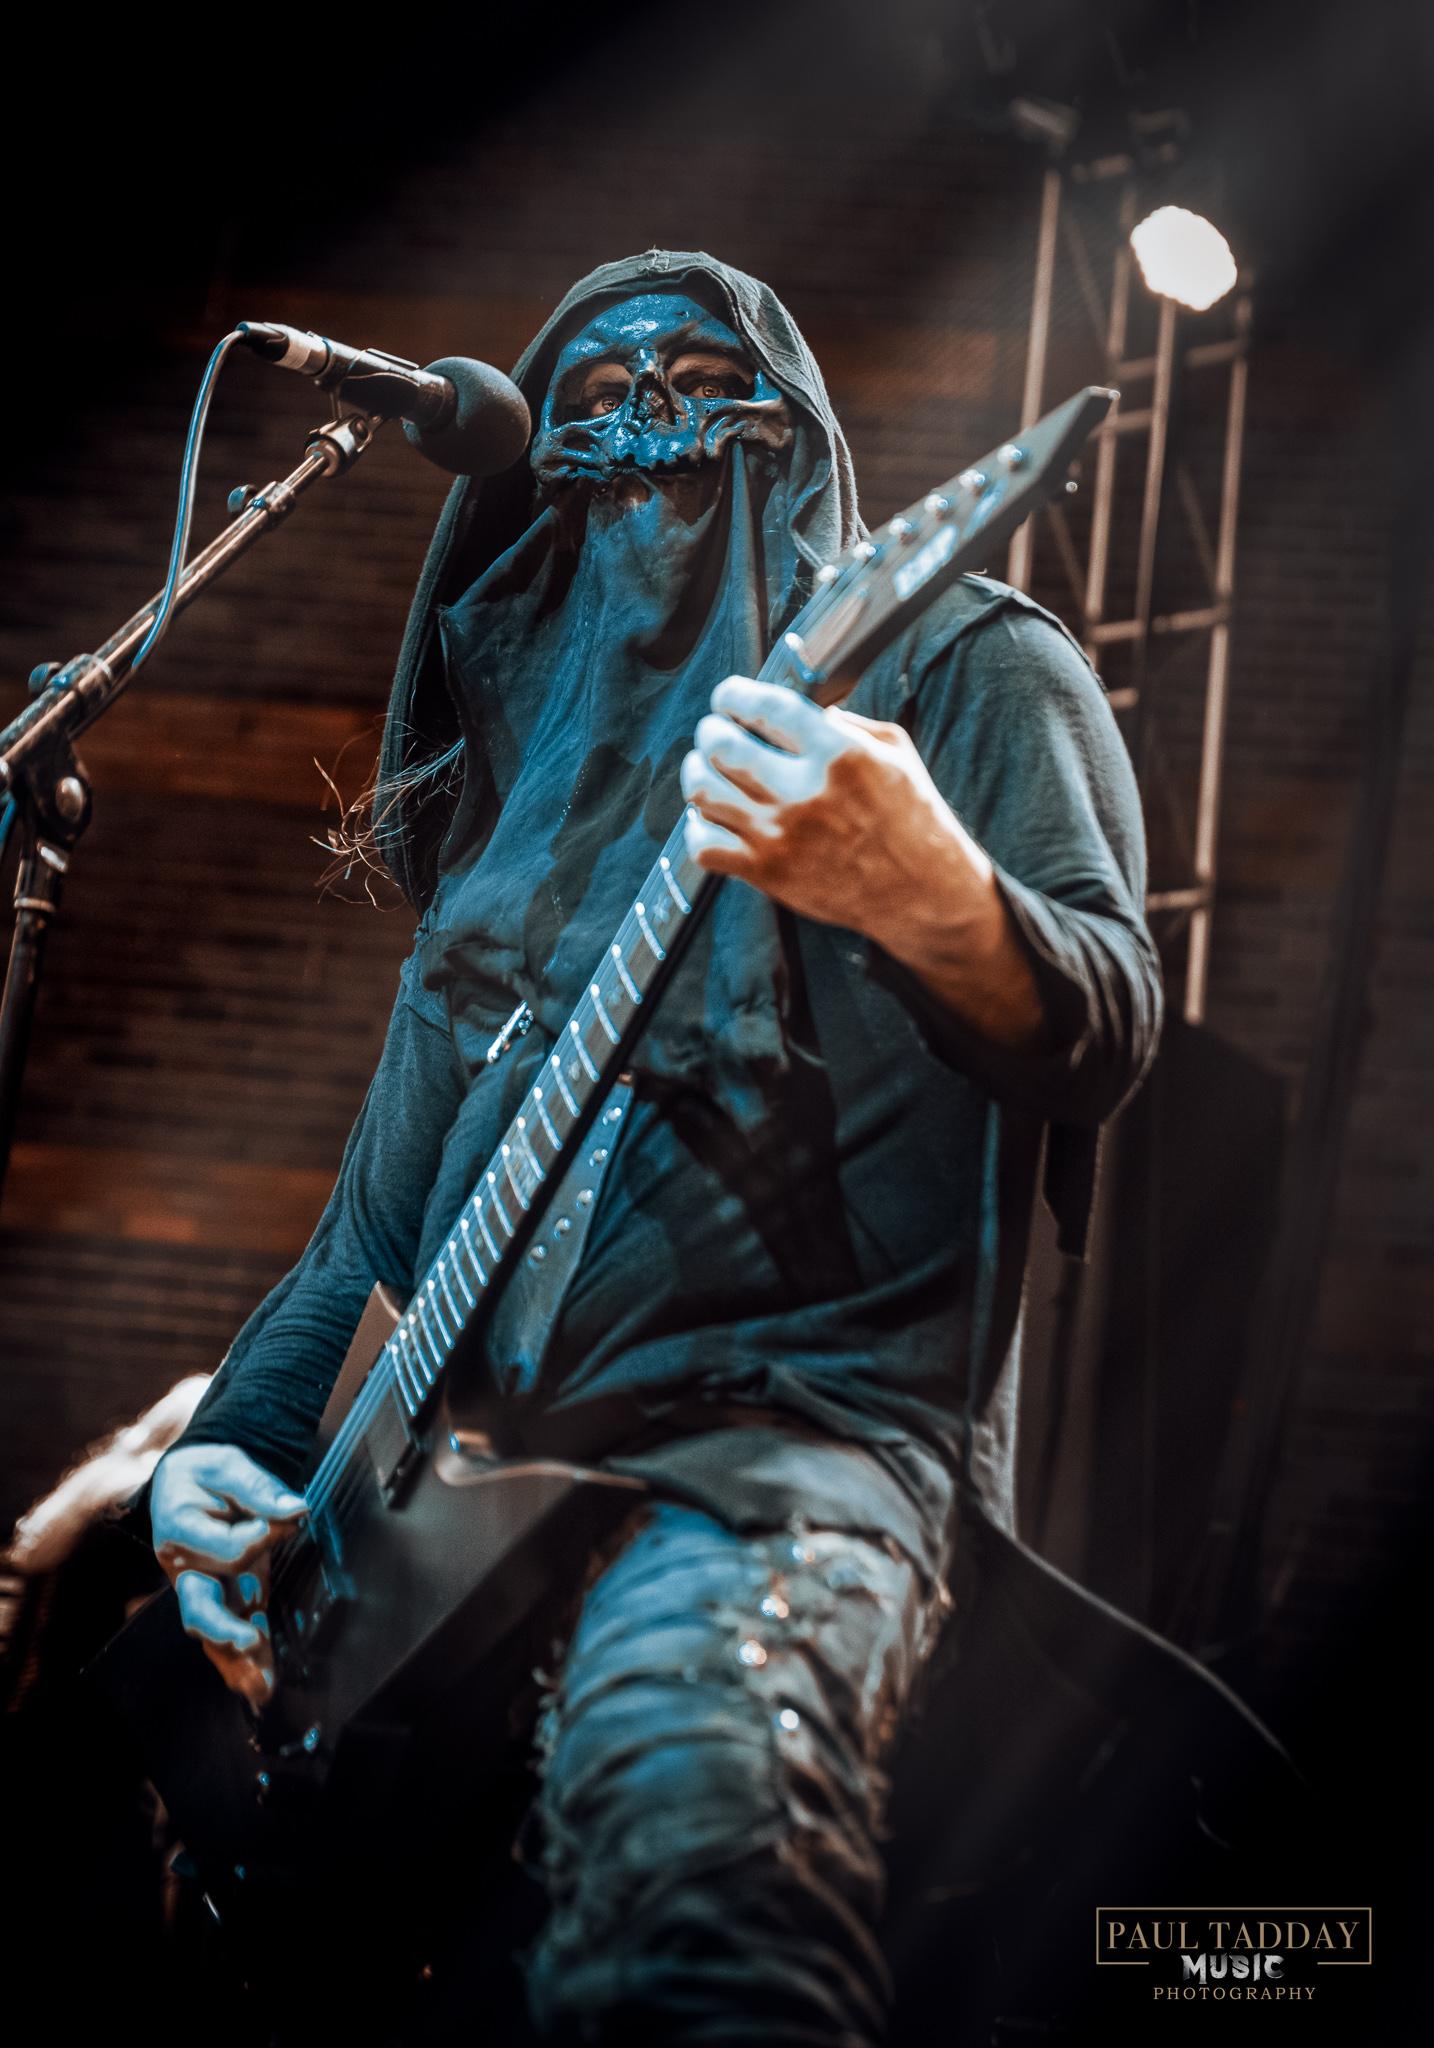 behemoth - brisbane - march 7 2019 - web - paul tadday photography - 21.jpg